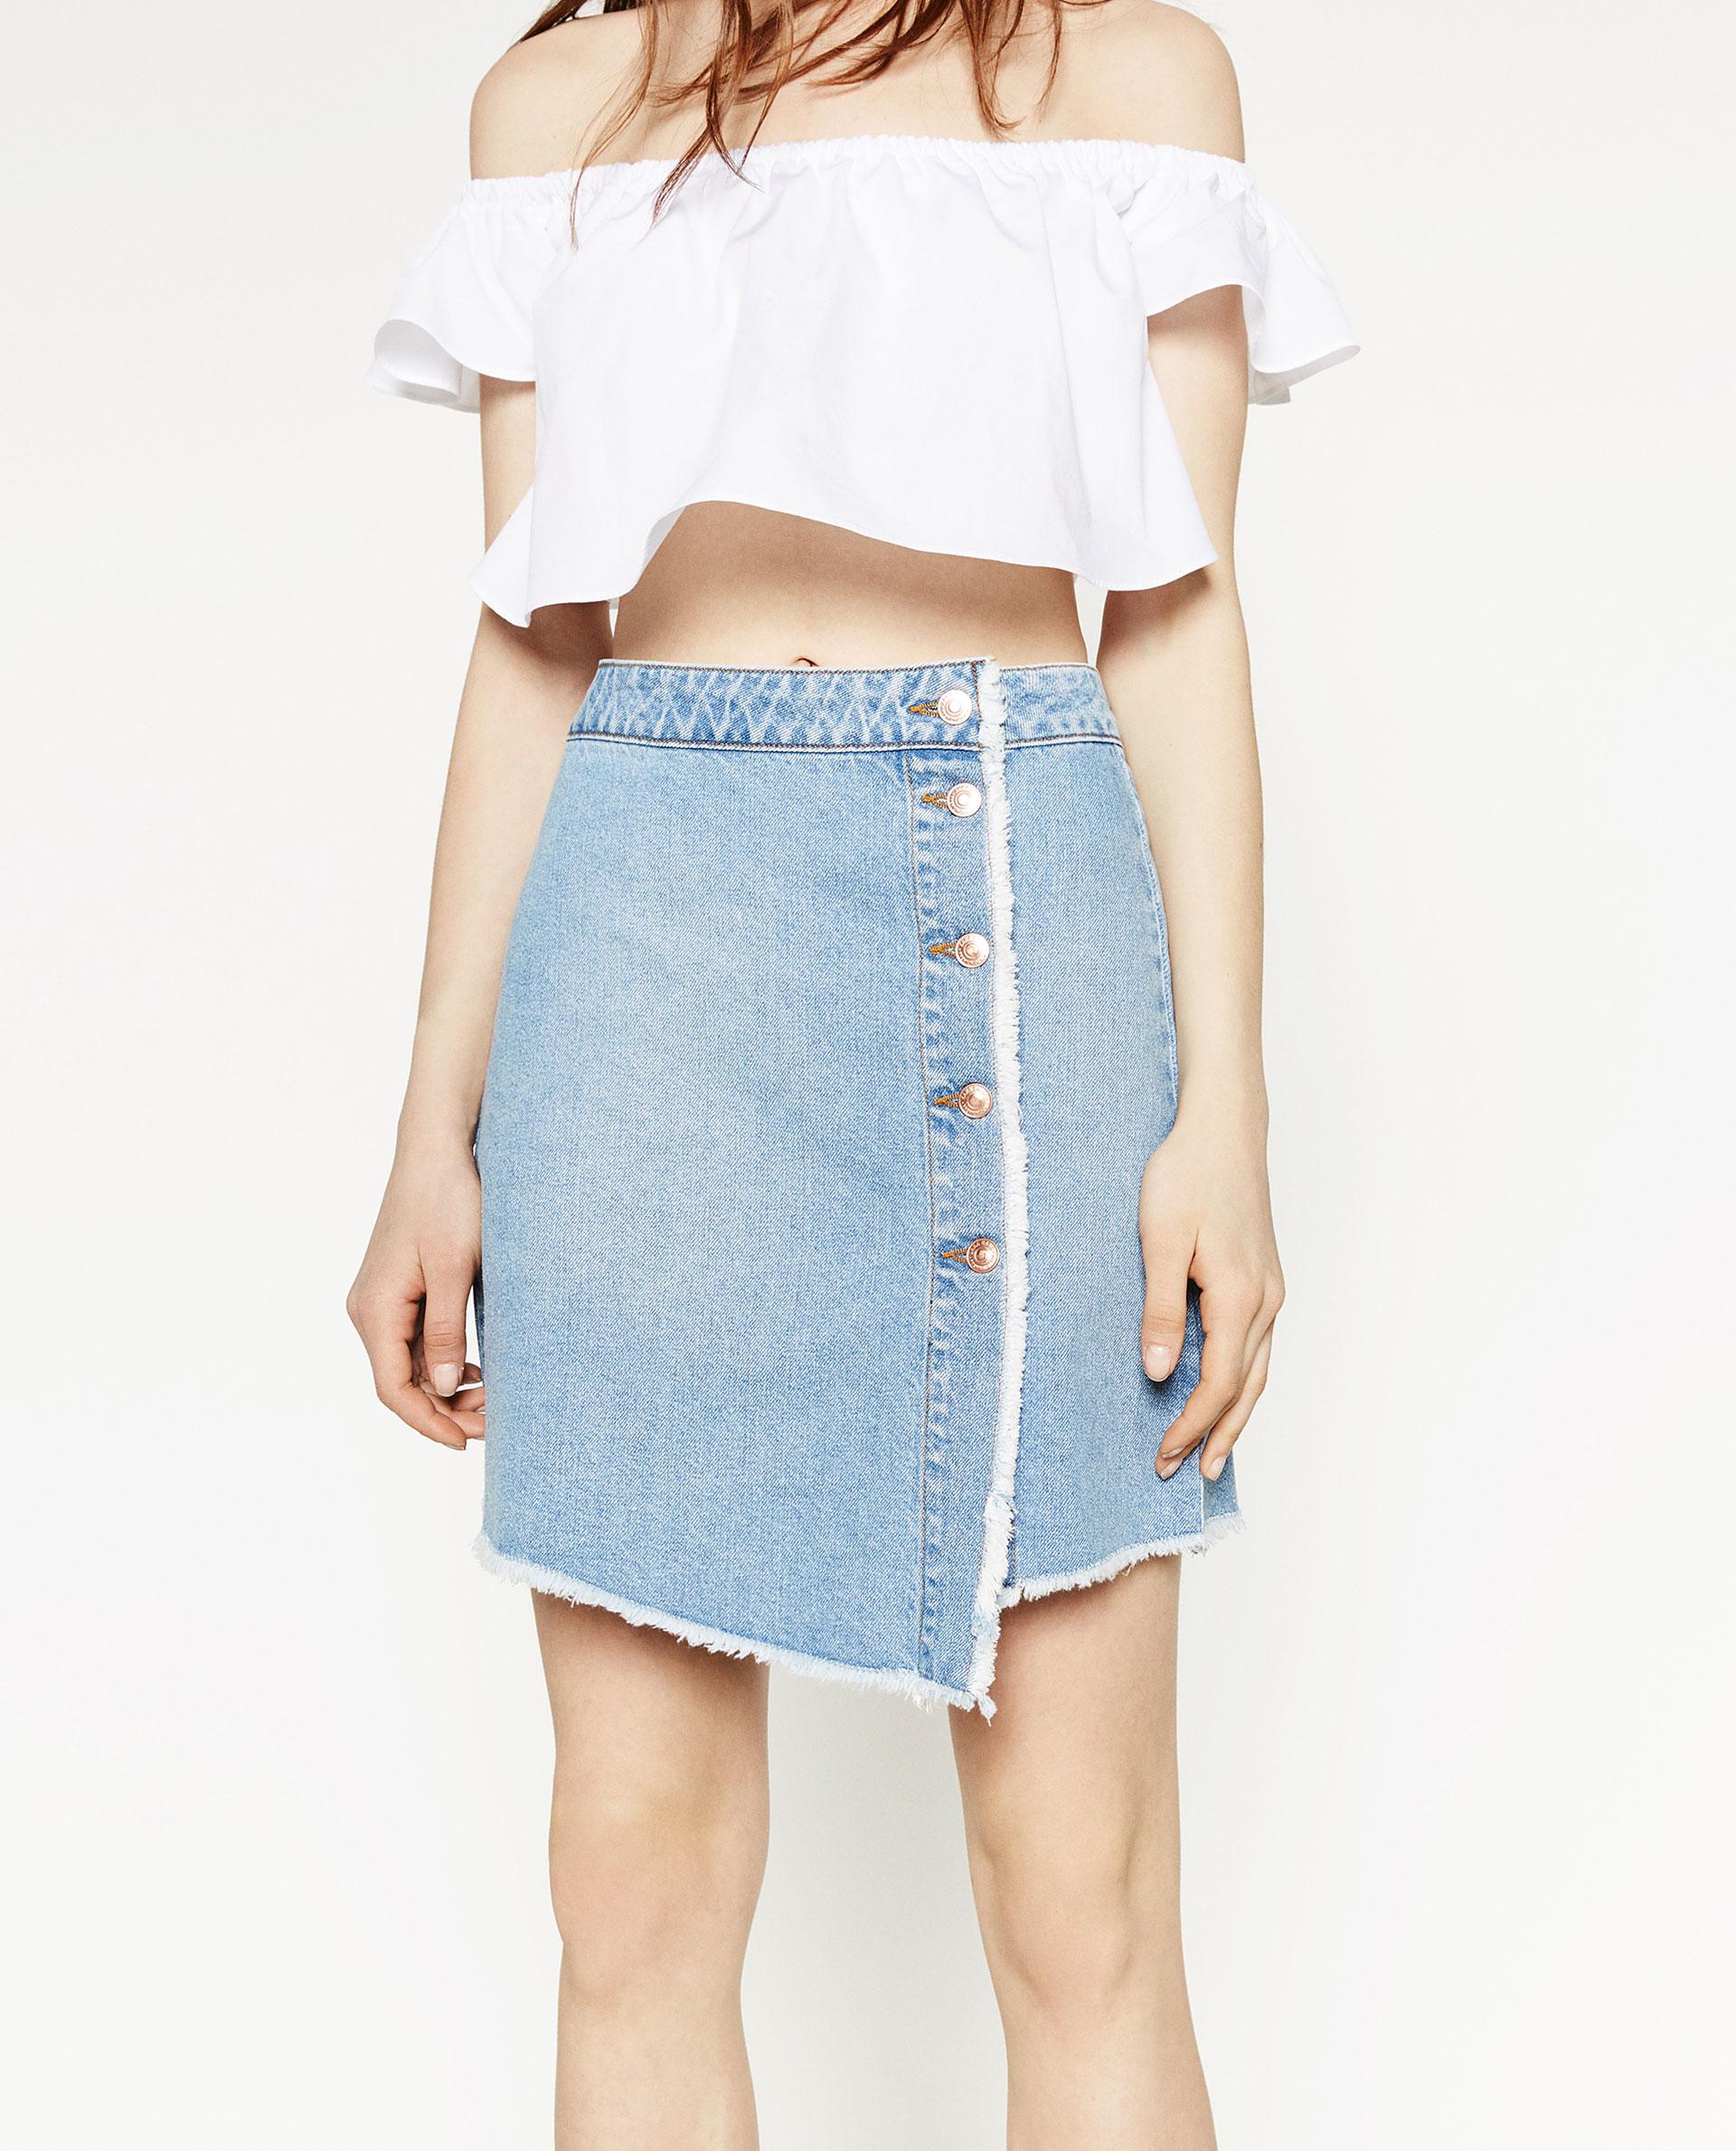 Zara A-line Skirt in Blue | Lyst